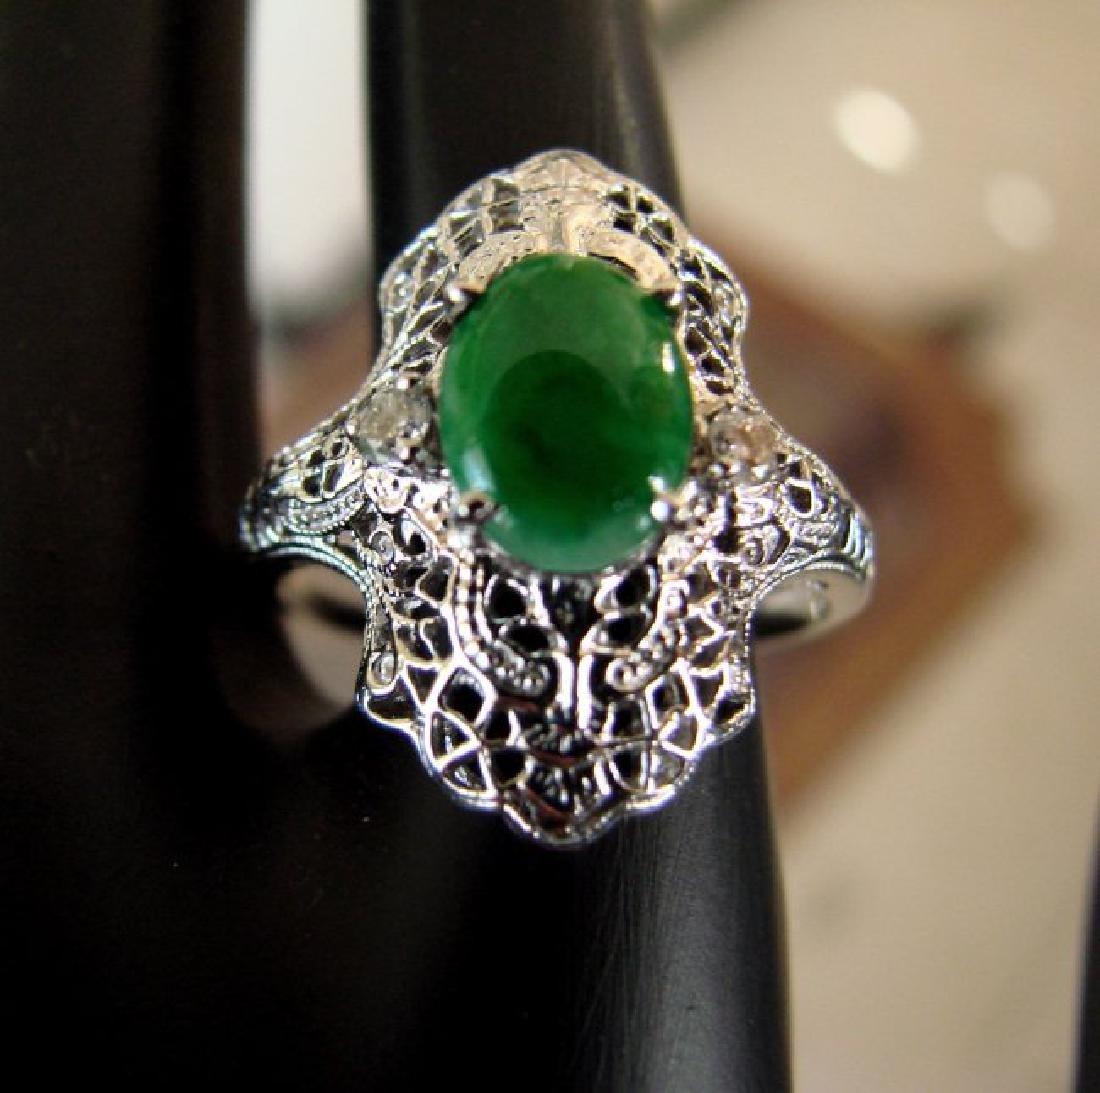 Anniversary Ring Imperial Jade/Diamond 1.04Ct 14k W/g - 3